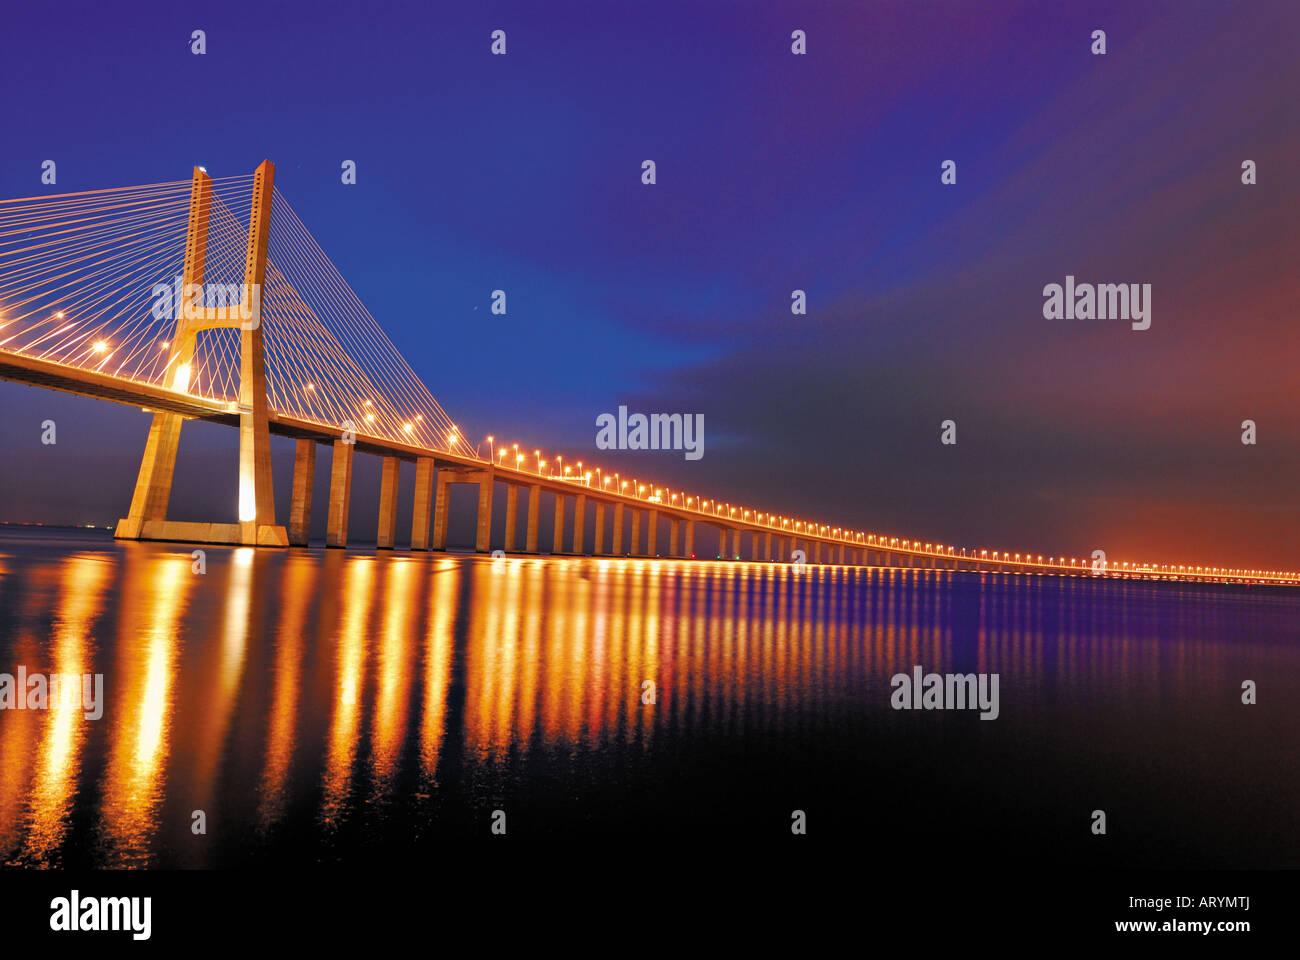 Vasco da Gama bridge by night, Lisbon, Portugal - Stock Image